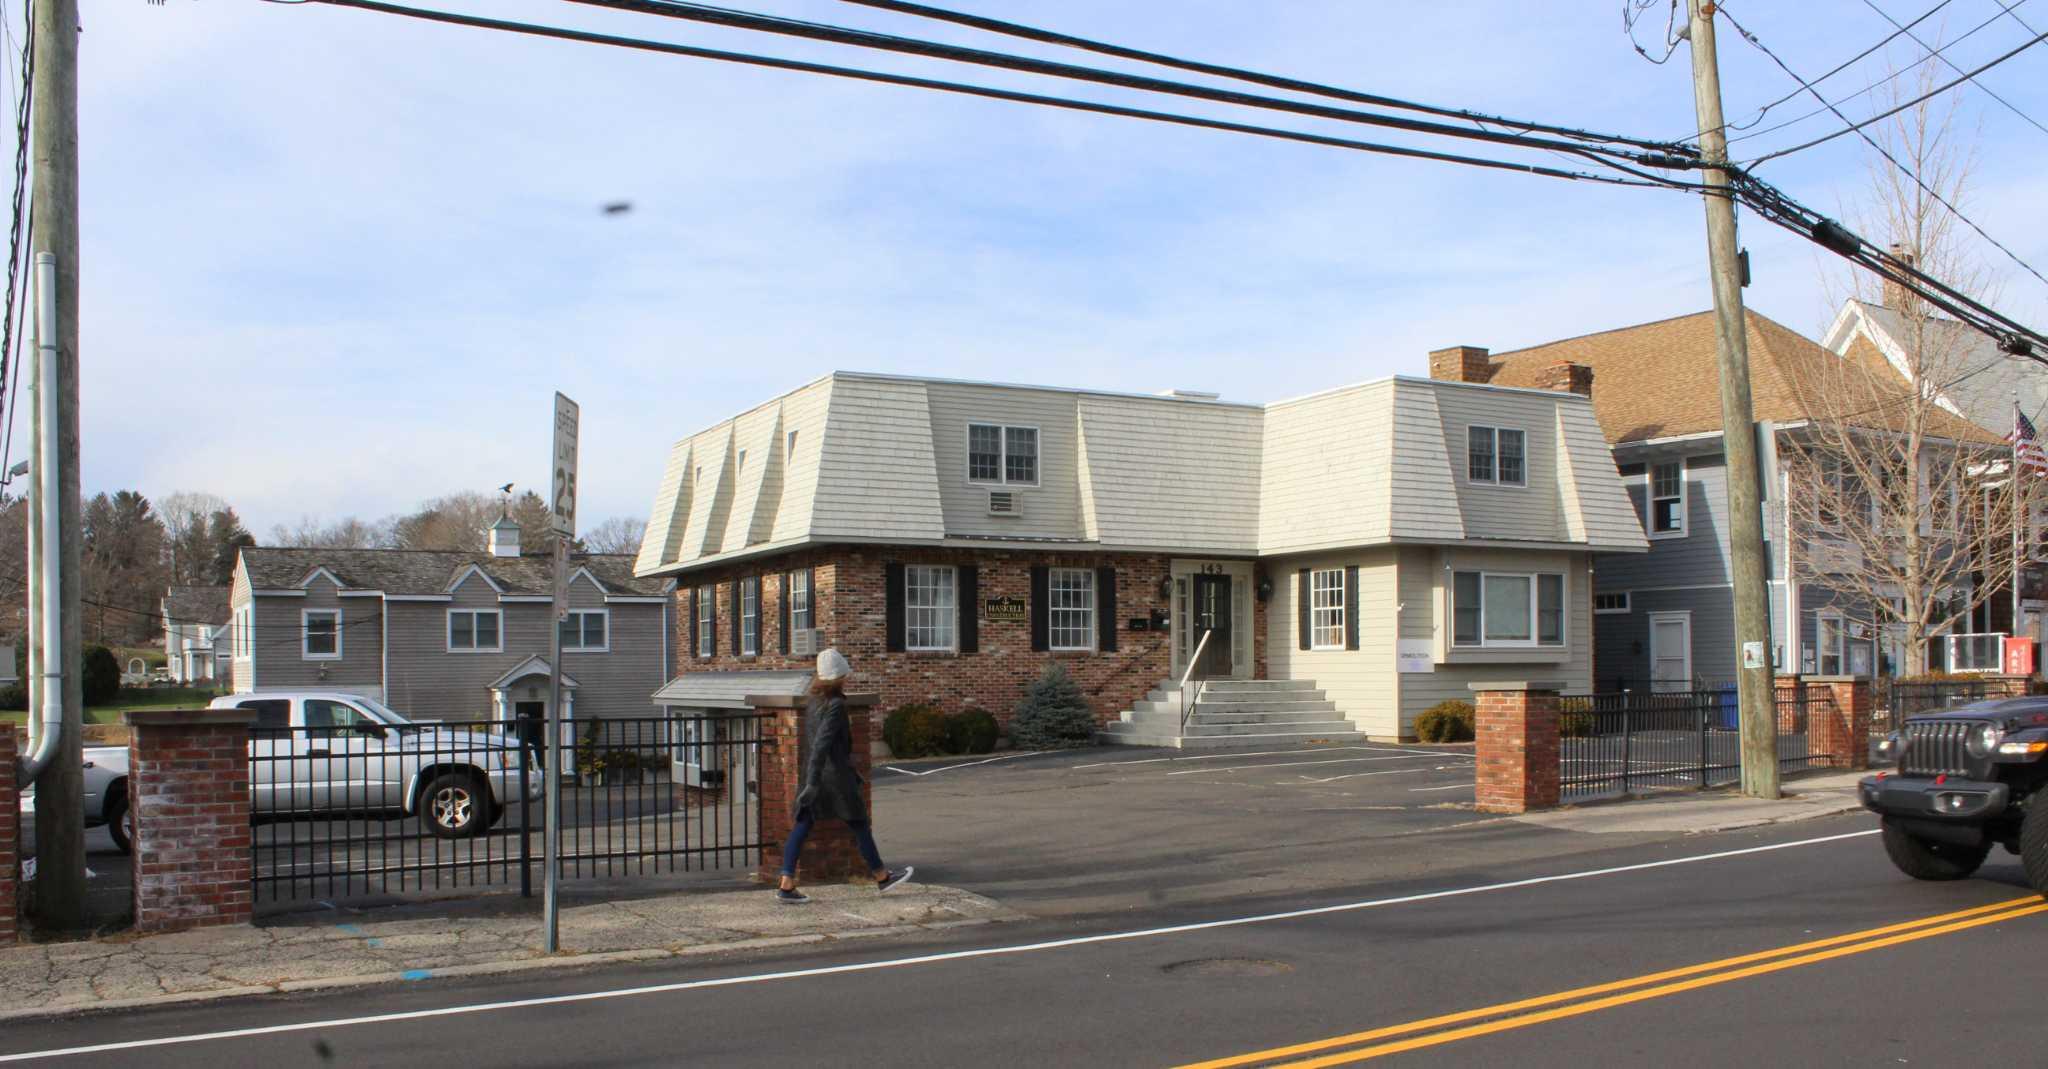 New apartment complex proposed for Norwalk's Rowayton neighborhood - CTInsider.com